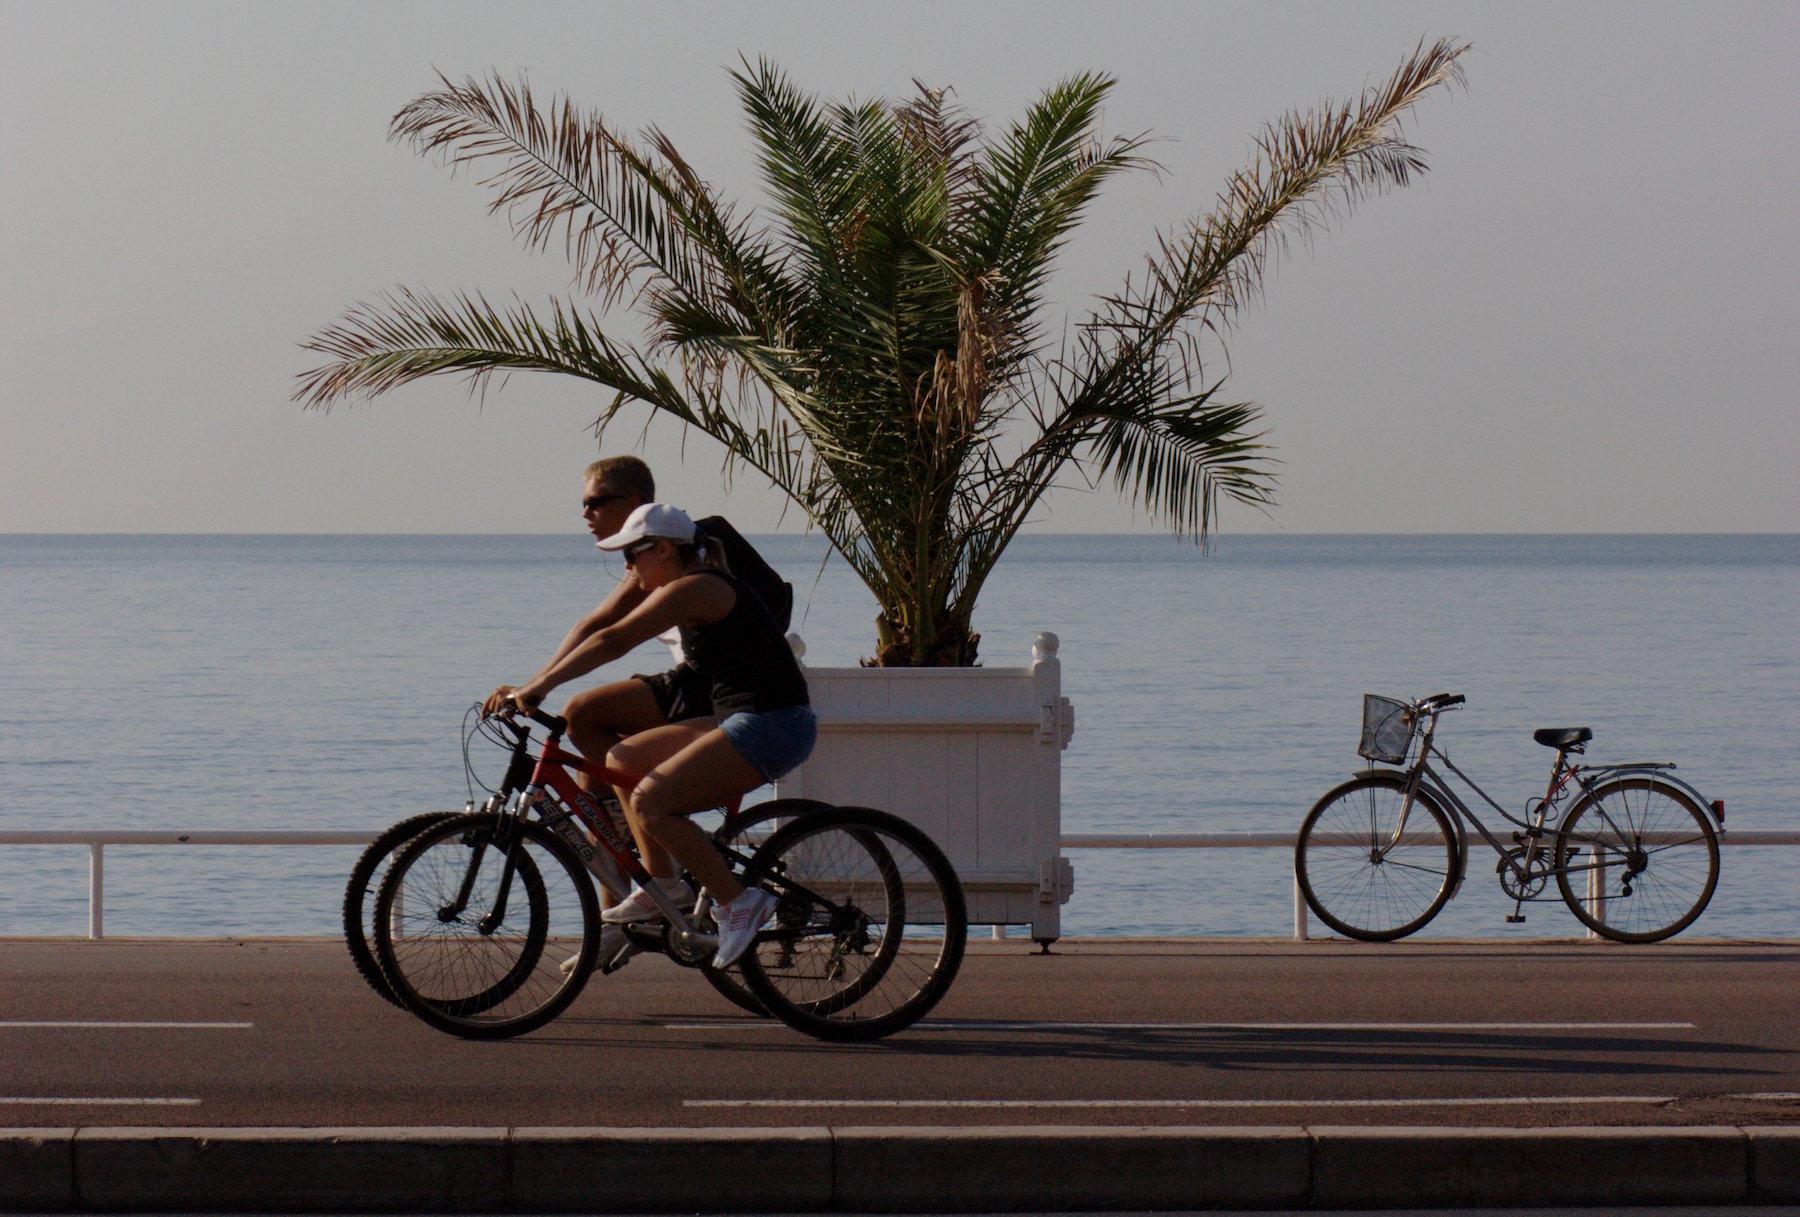 La carte des pistes cyclables de Nice (06)